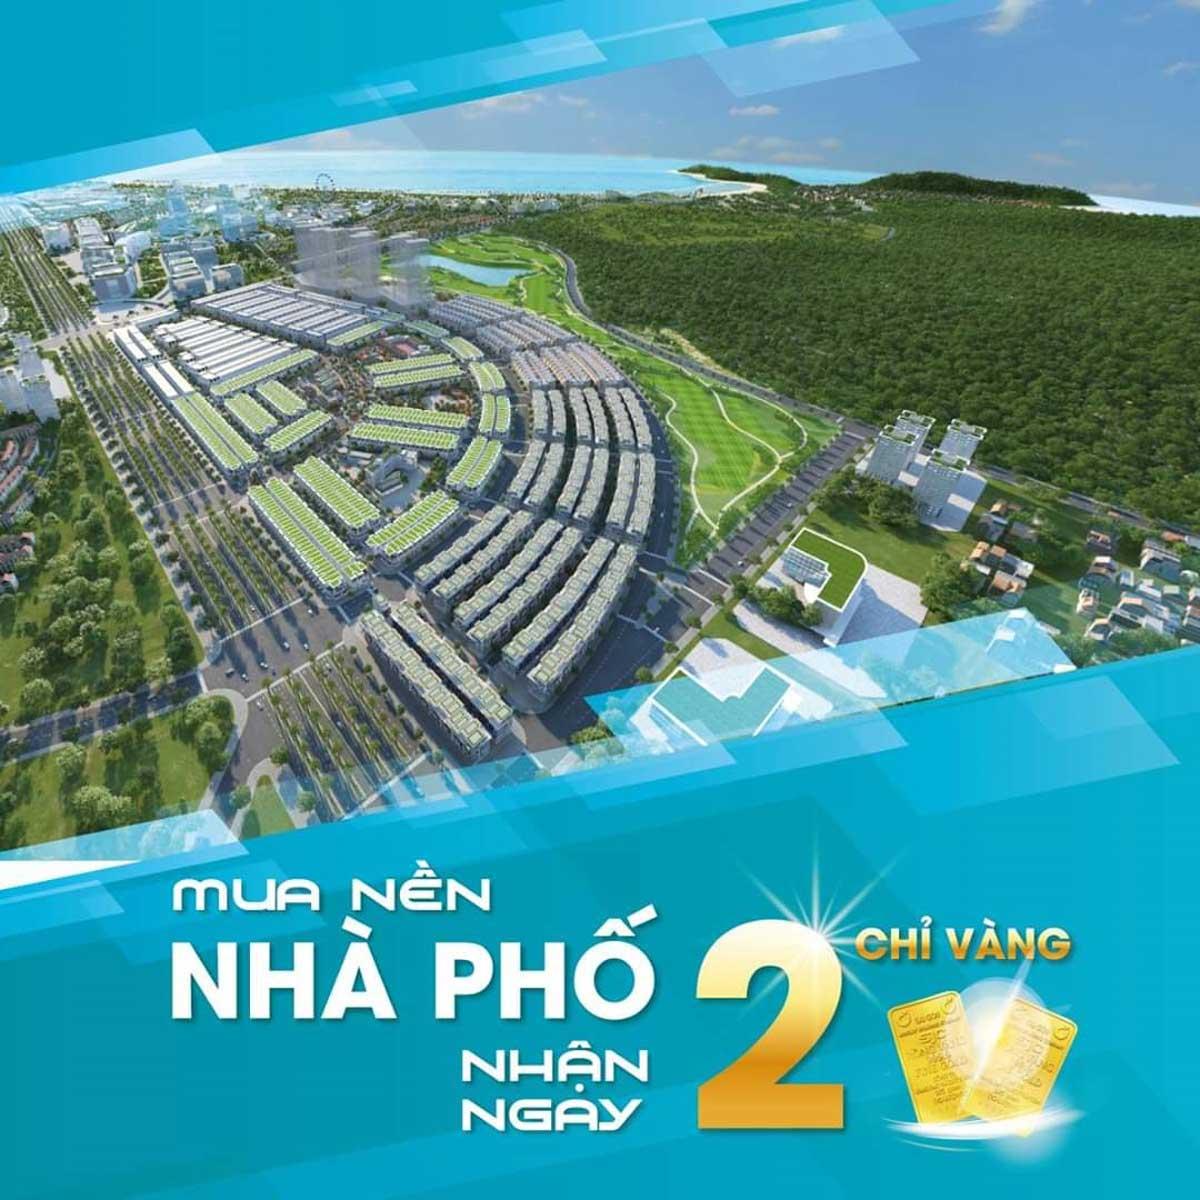 nen-nha-pho-ky-co-gateway